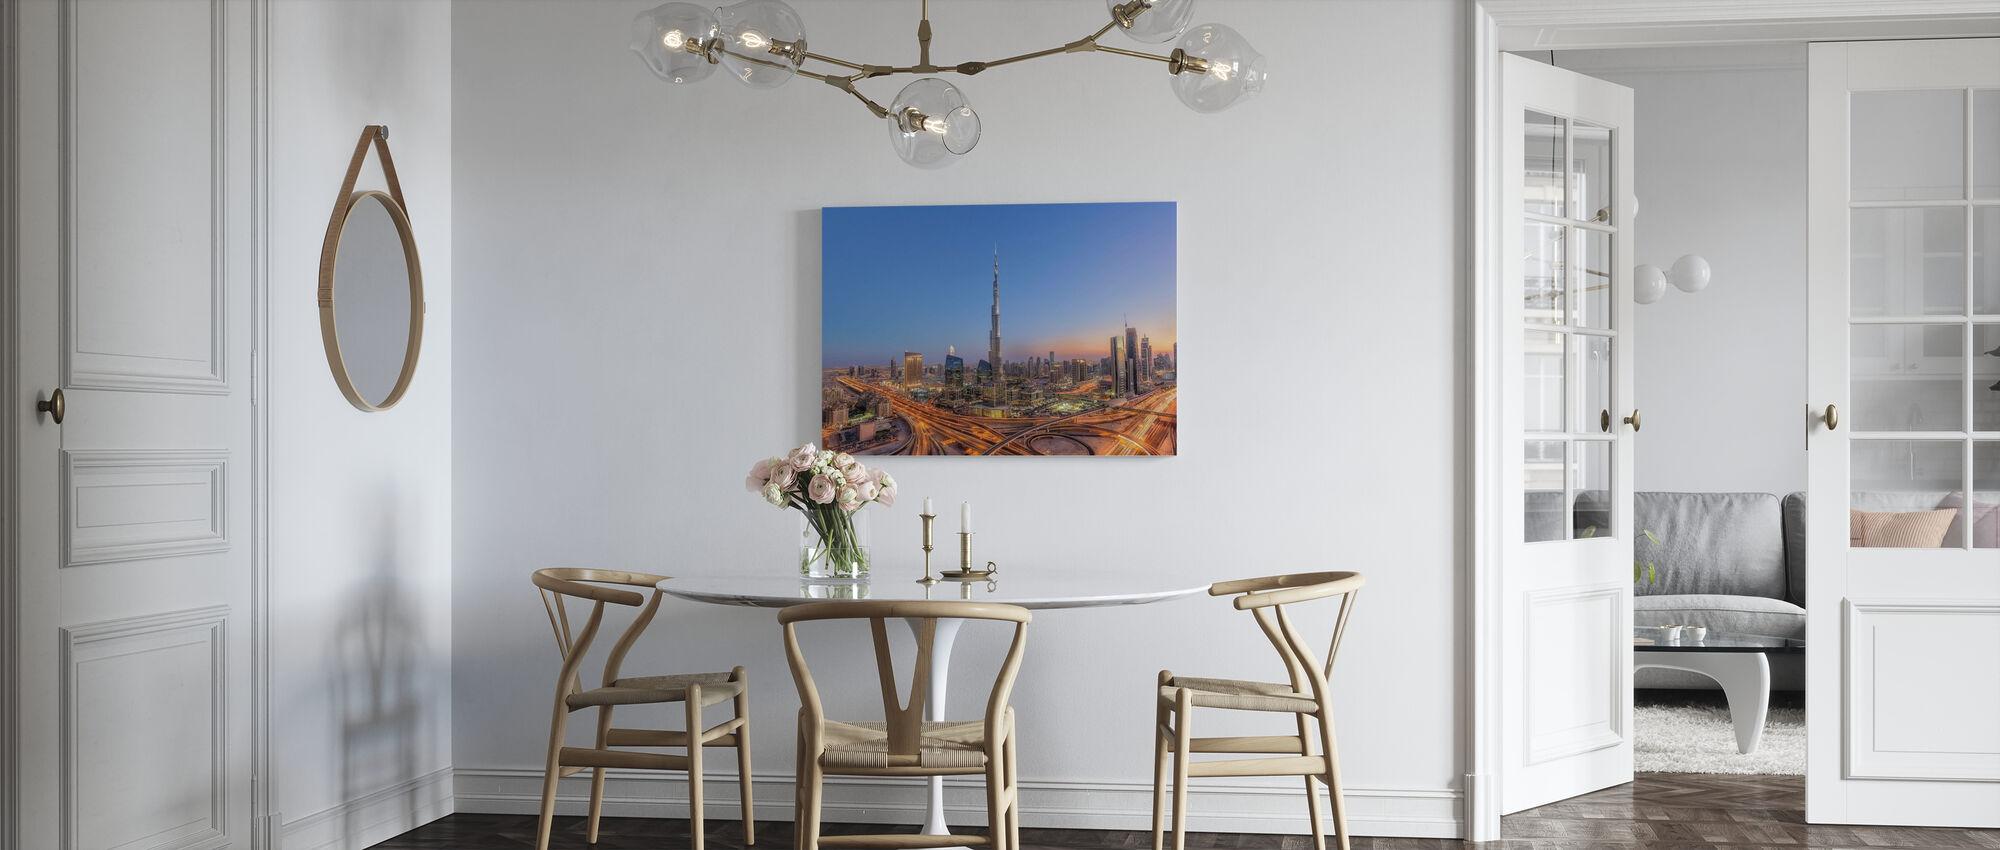 Fantastiska Burj Khalifah - Canvastavla - Kök